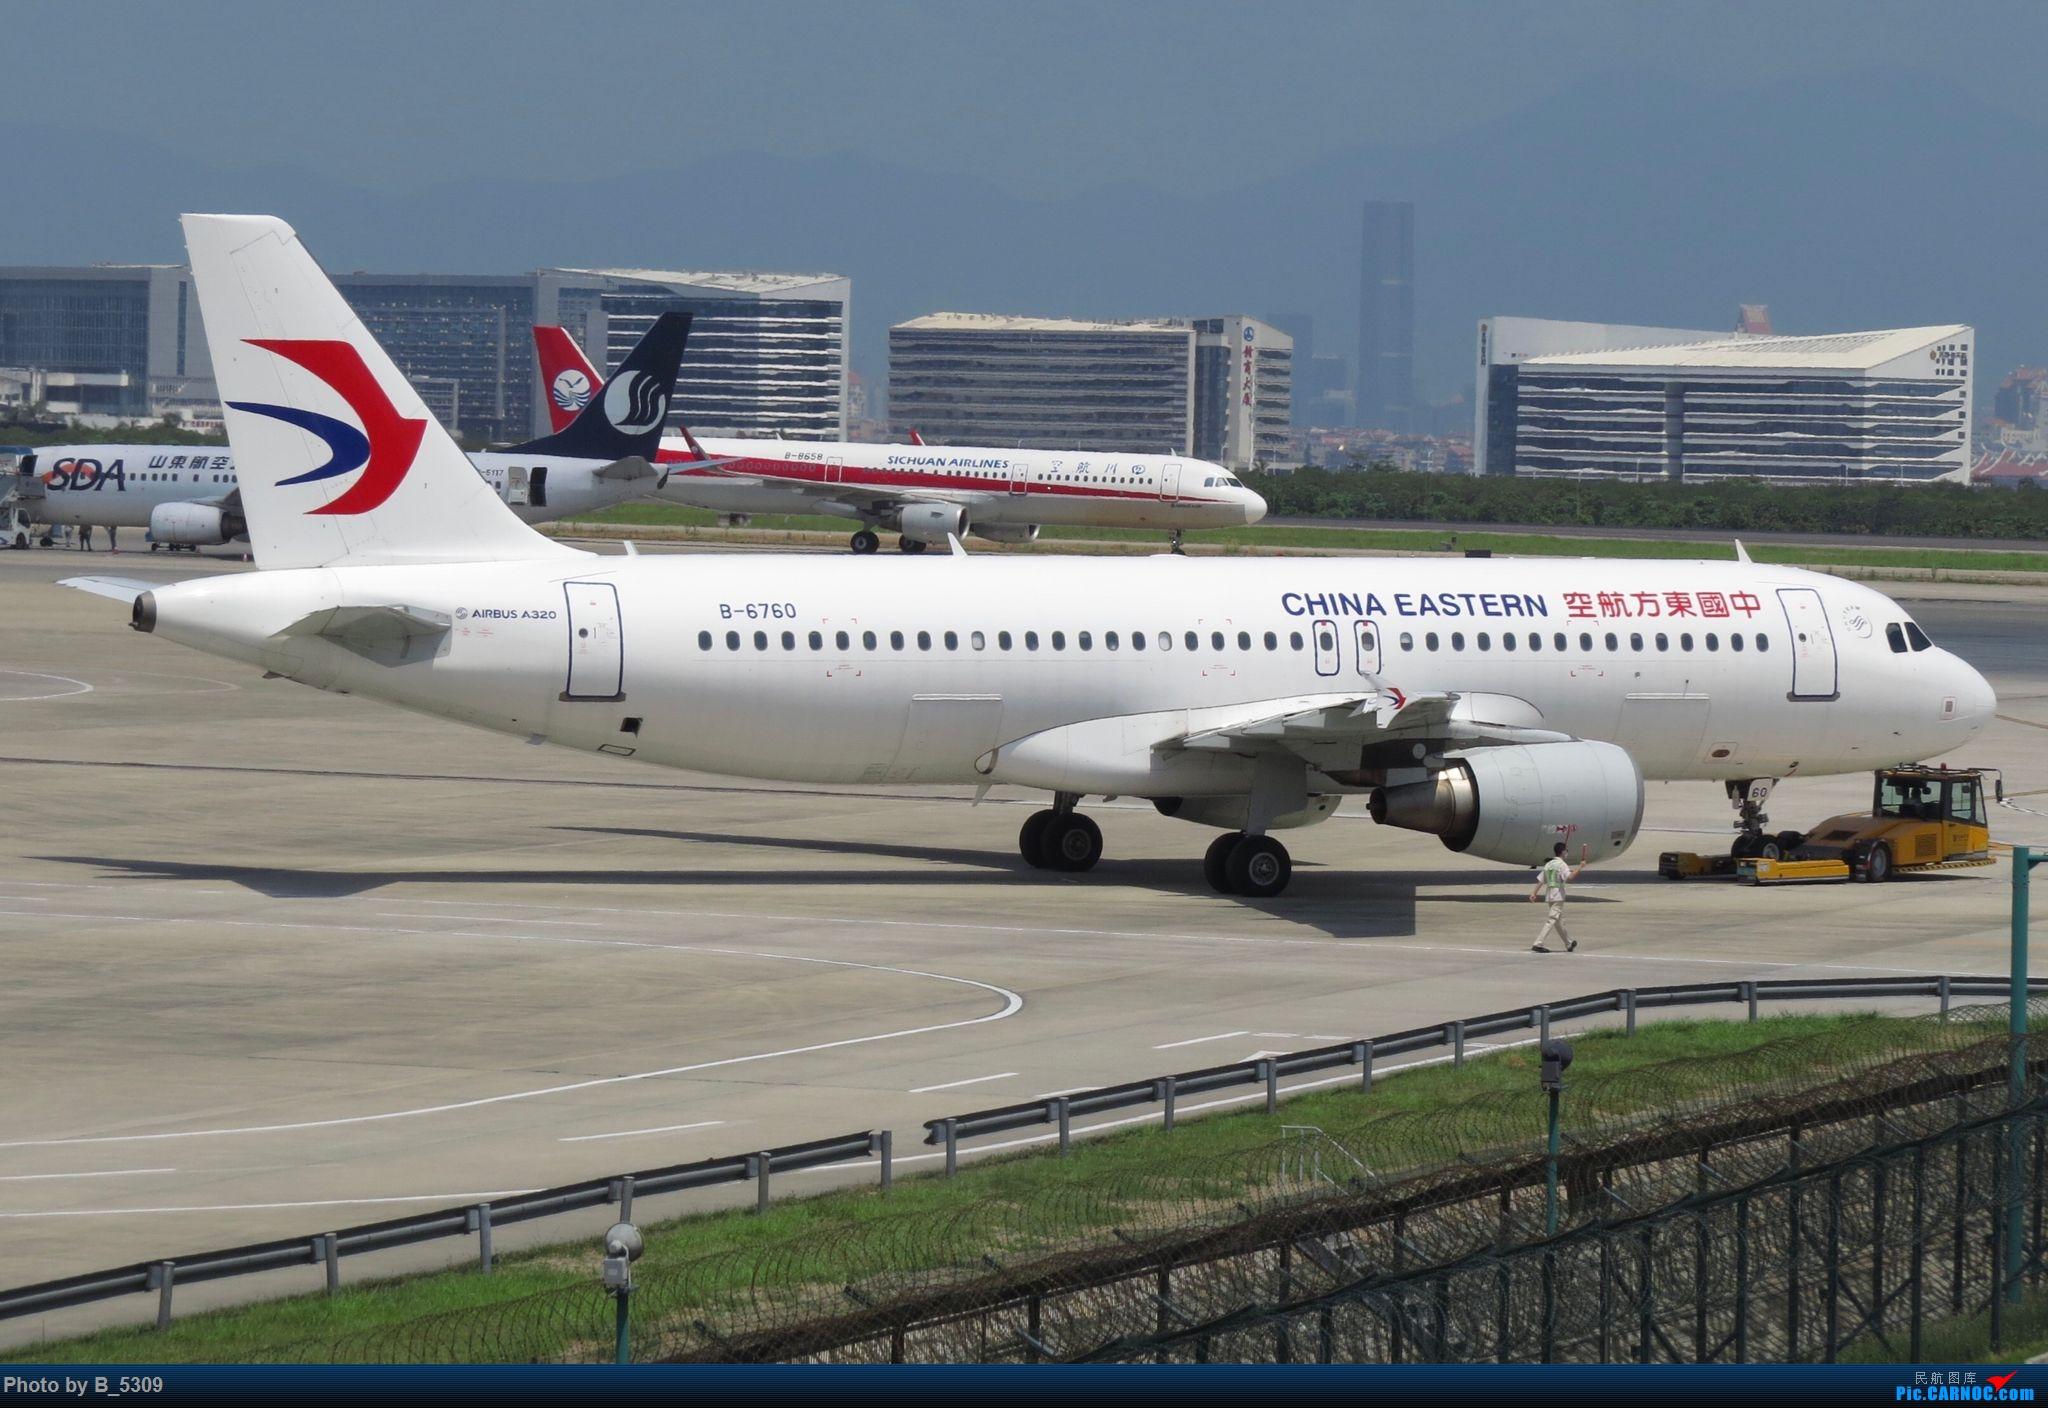 Re:[原创]逮KLM的大中午… AIRBUS A320-200 B-6760 中国厦门高崎国际机场